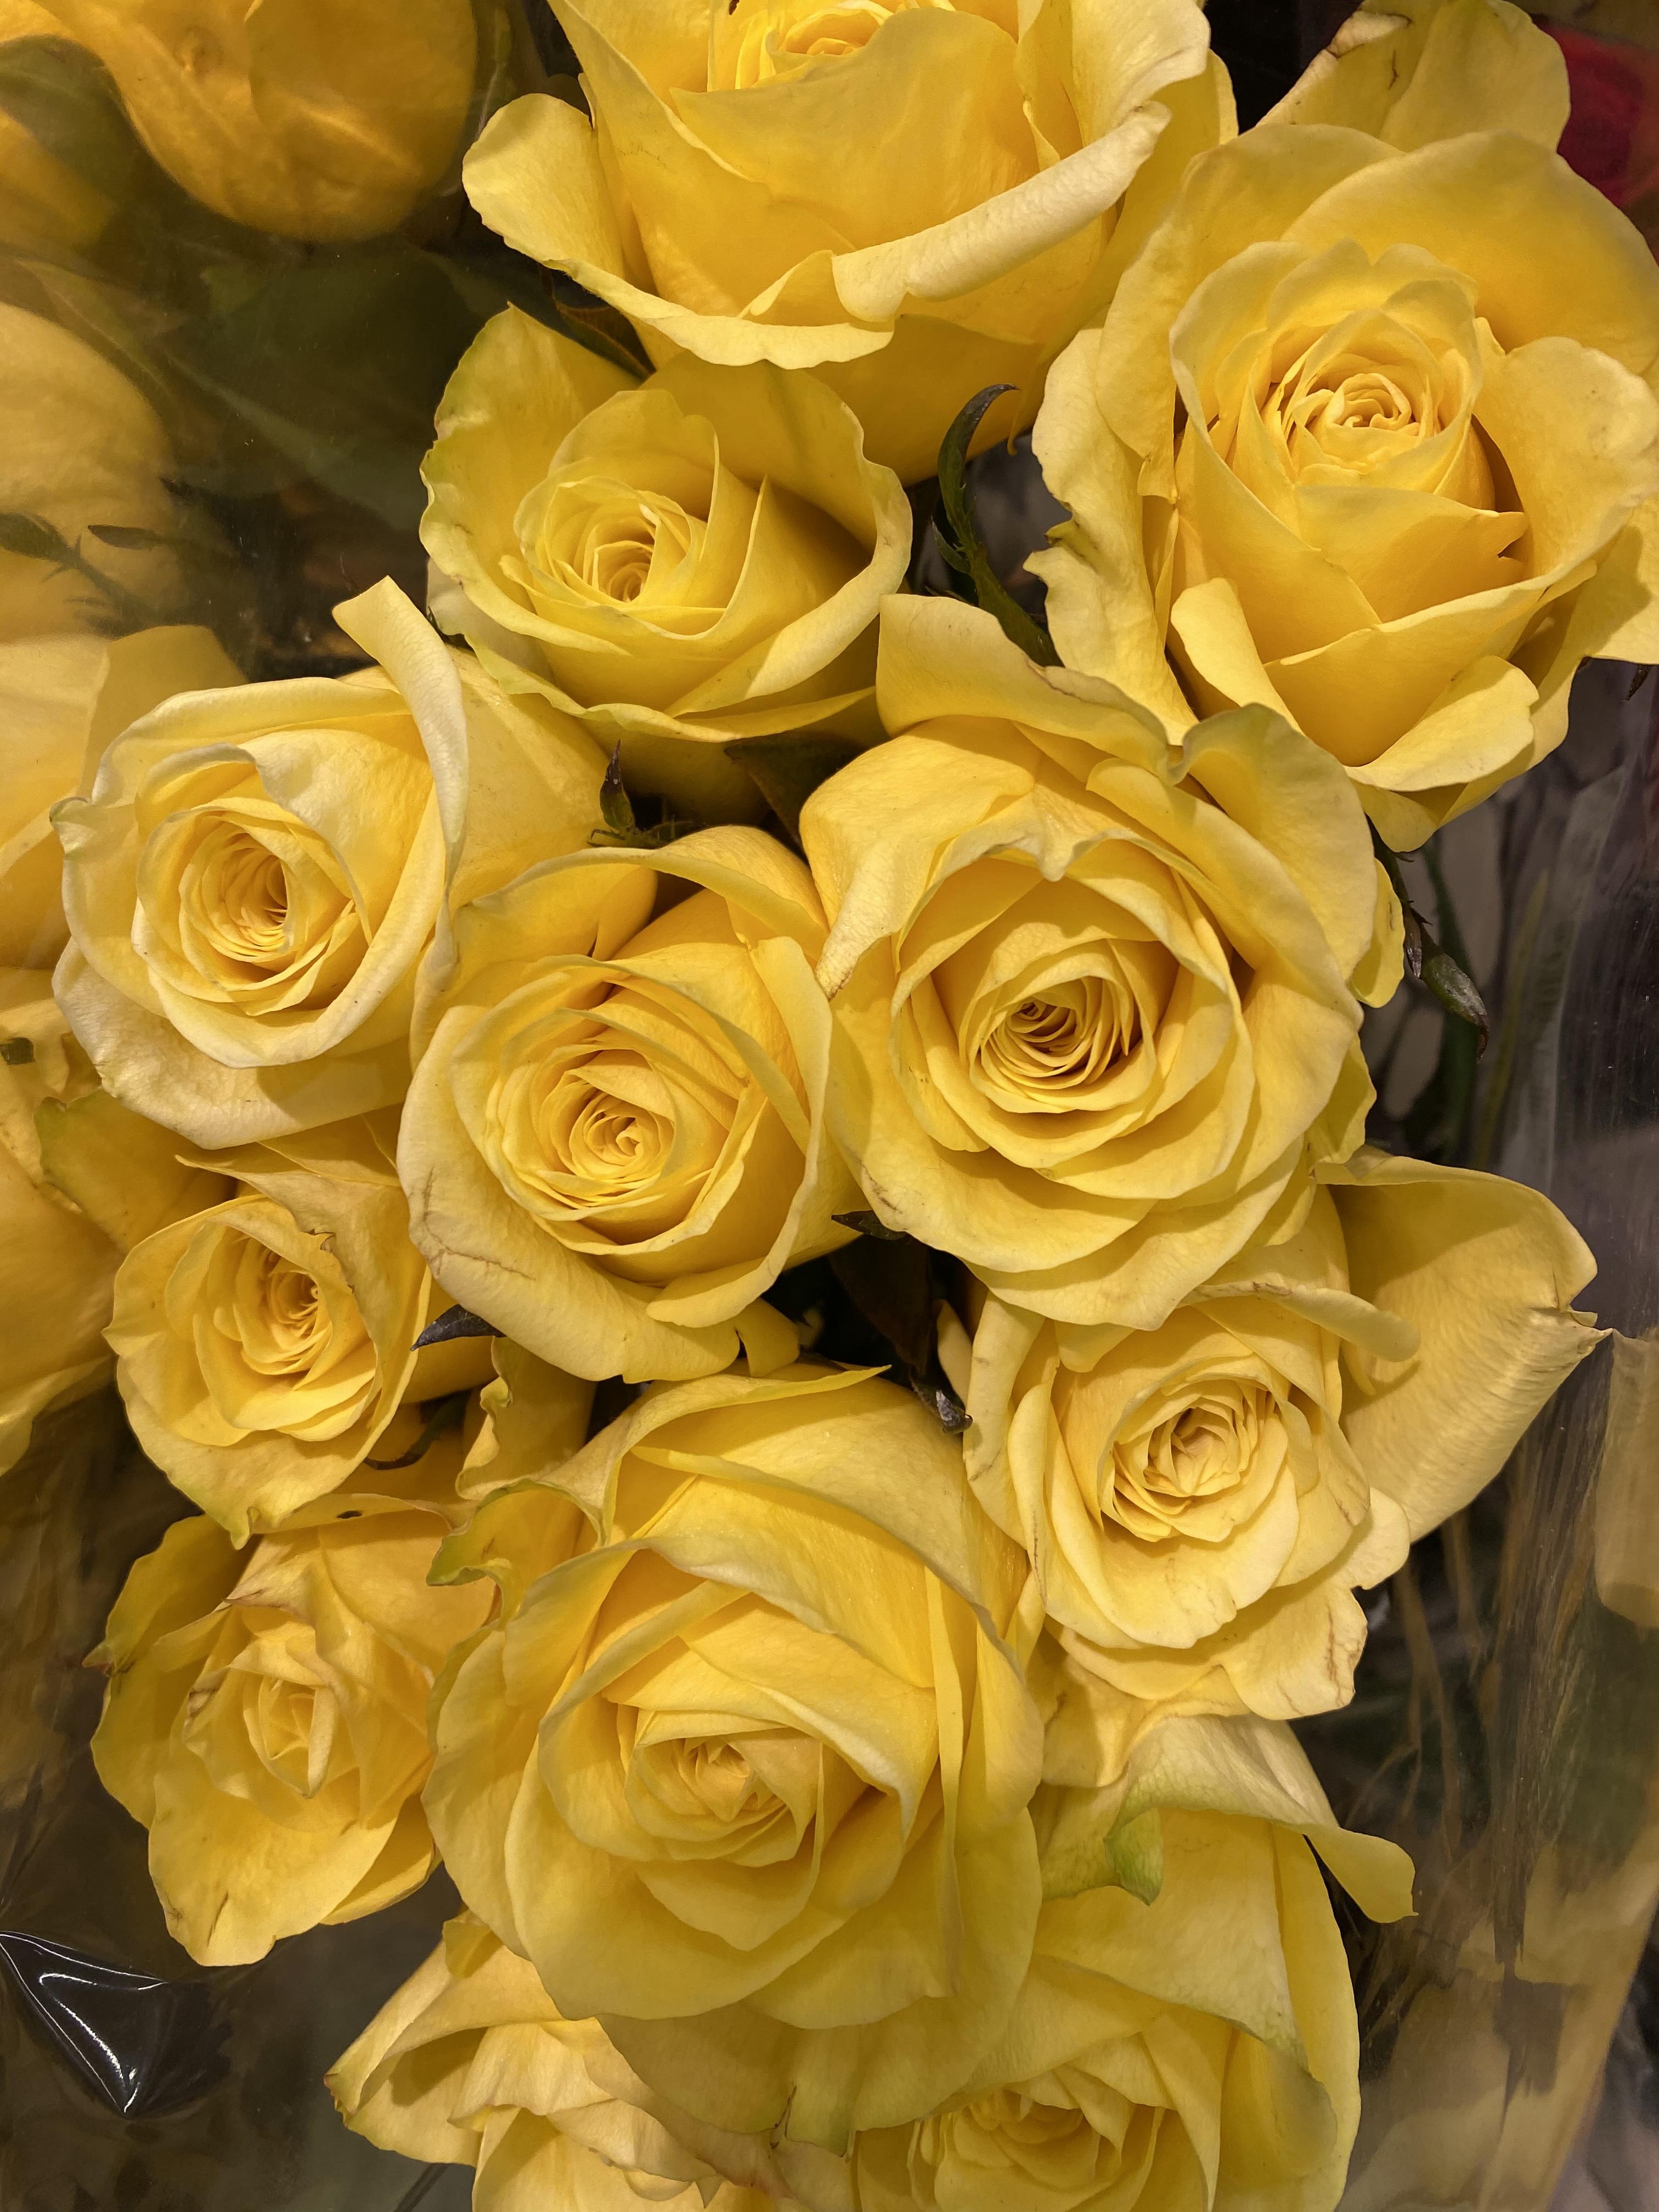 Rose yellow 3_7_1